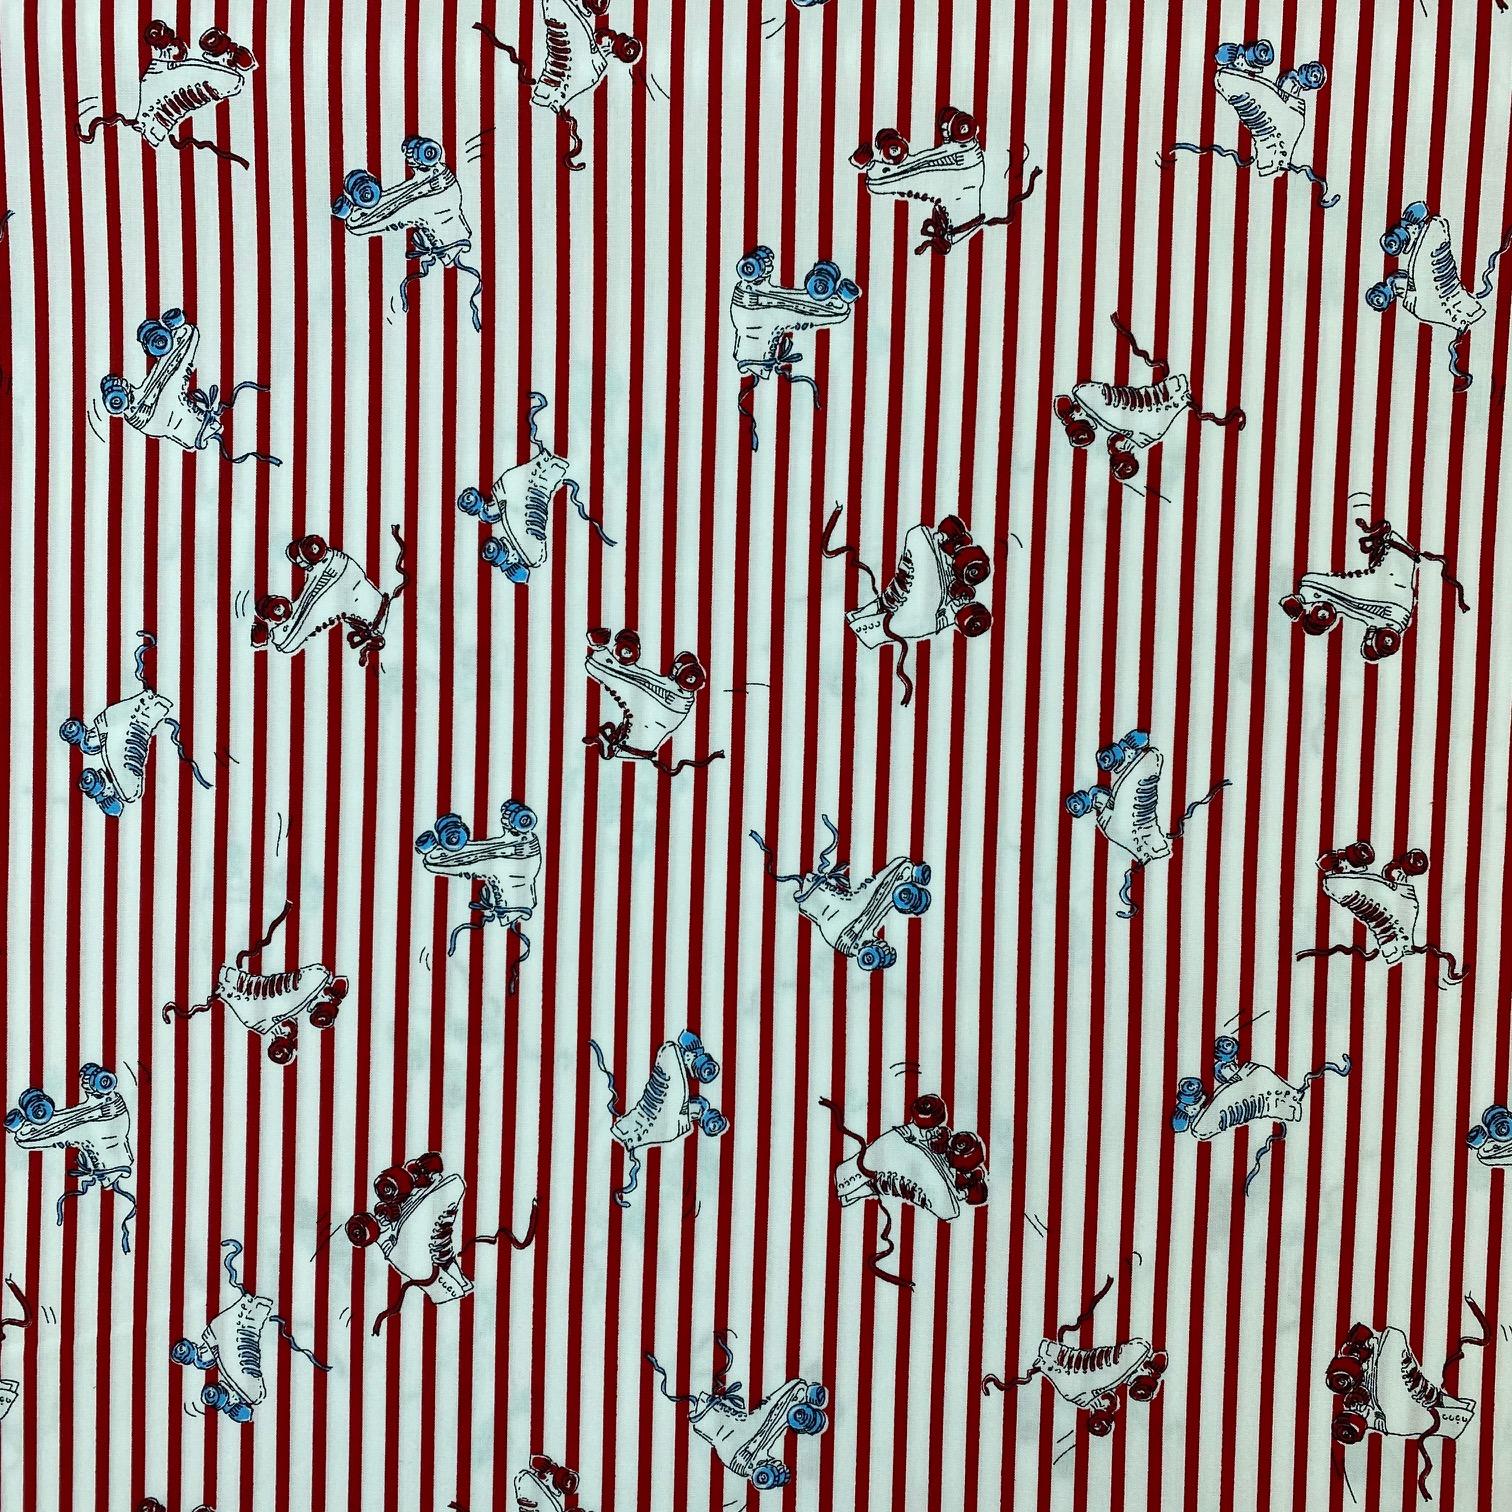 Baumwollpopelin, Streifen&Inlineskate. Art. SW11398